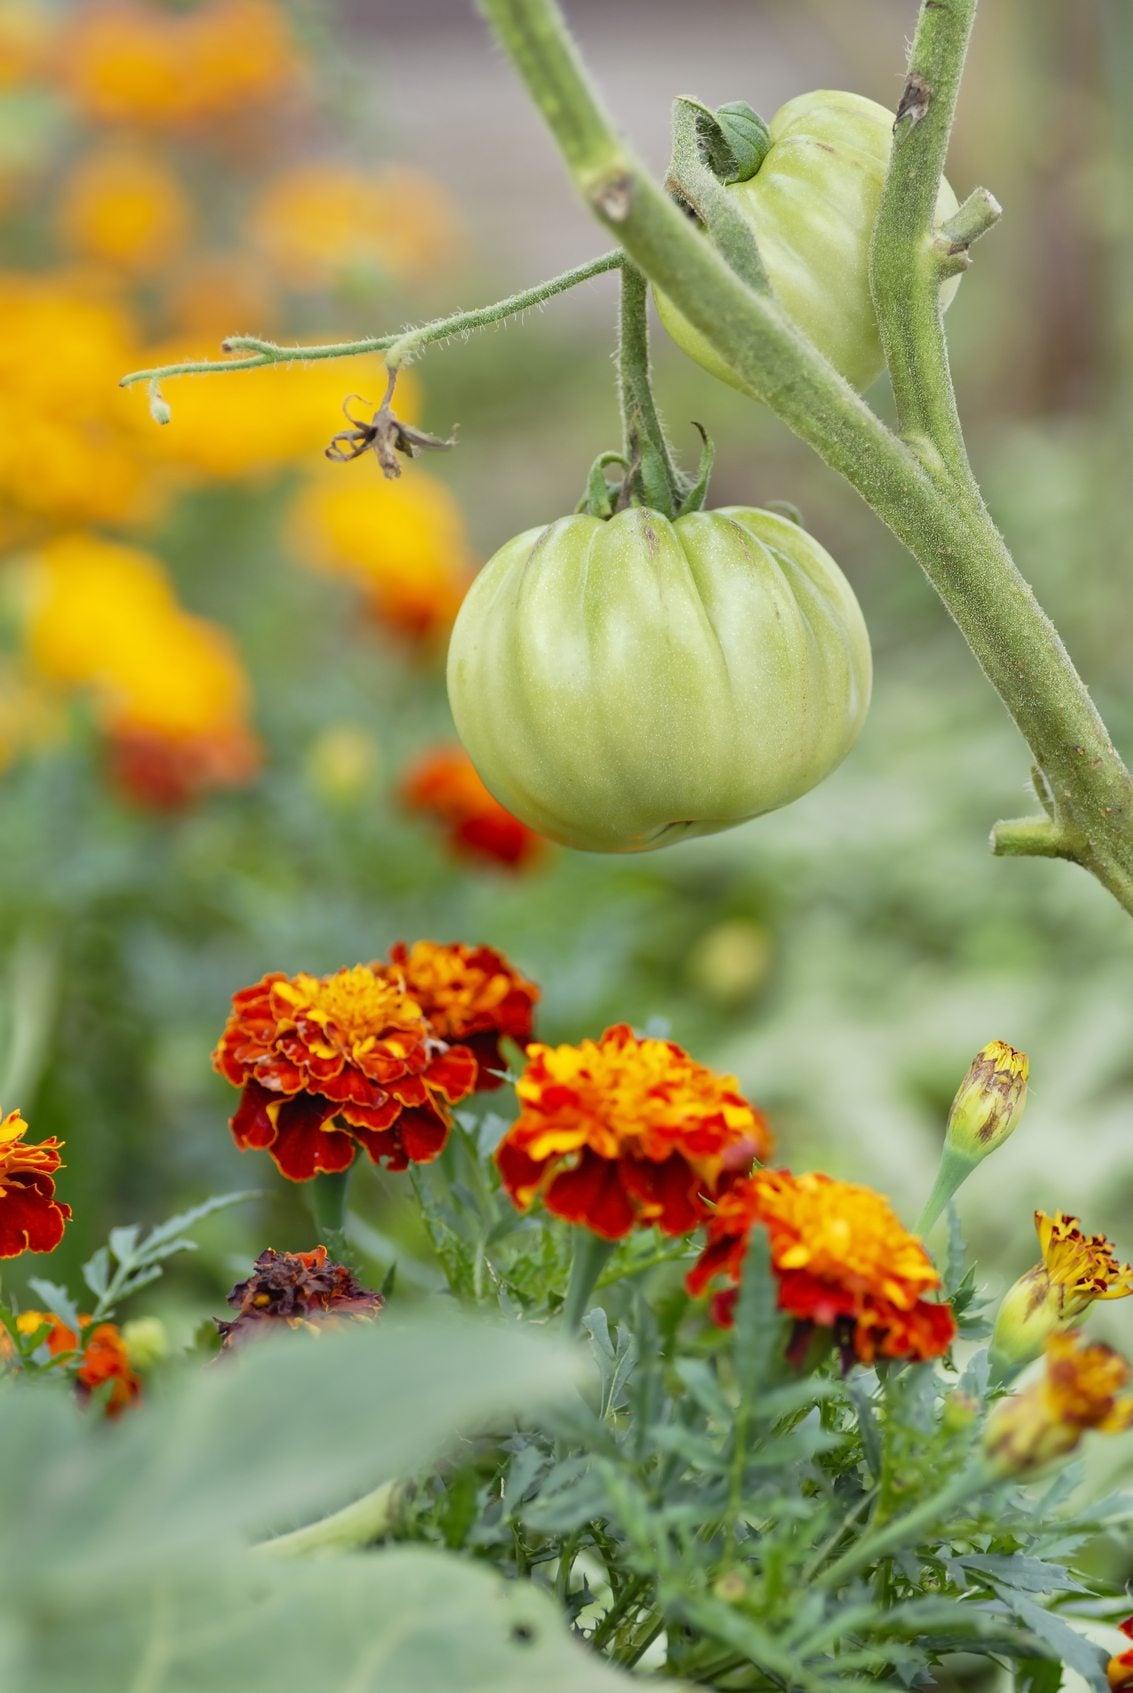 The Marigold Tarot Major Arcana The: Planting Marigolds With Tomatoes